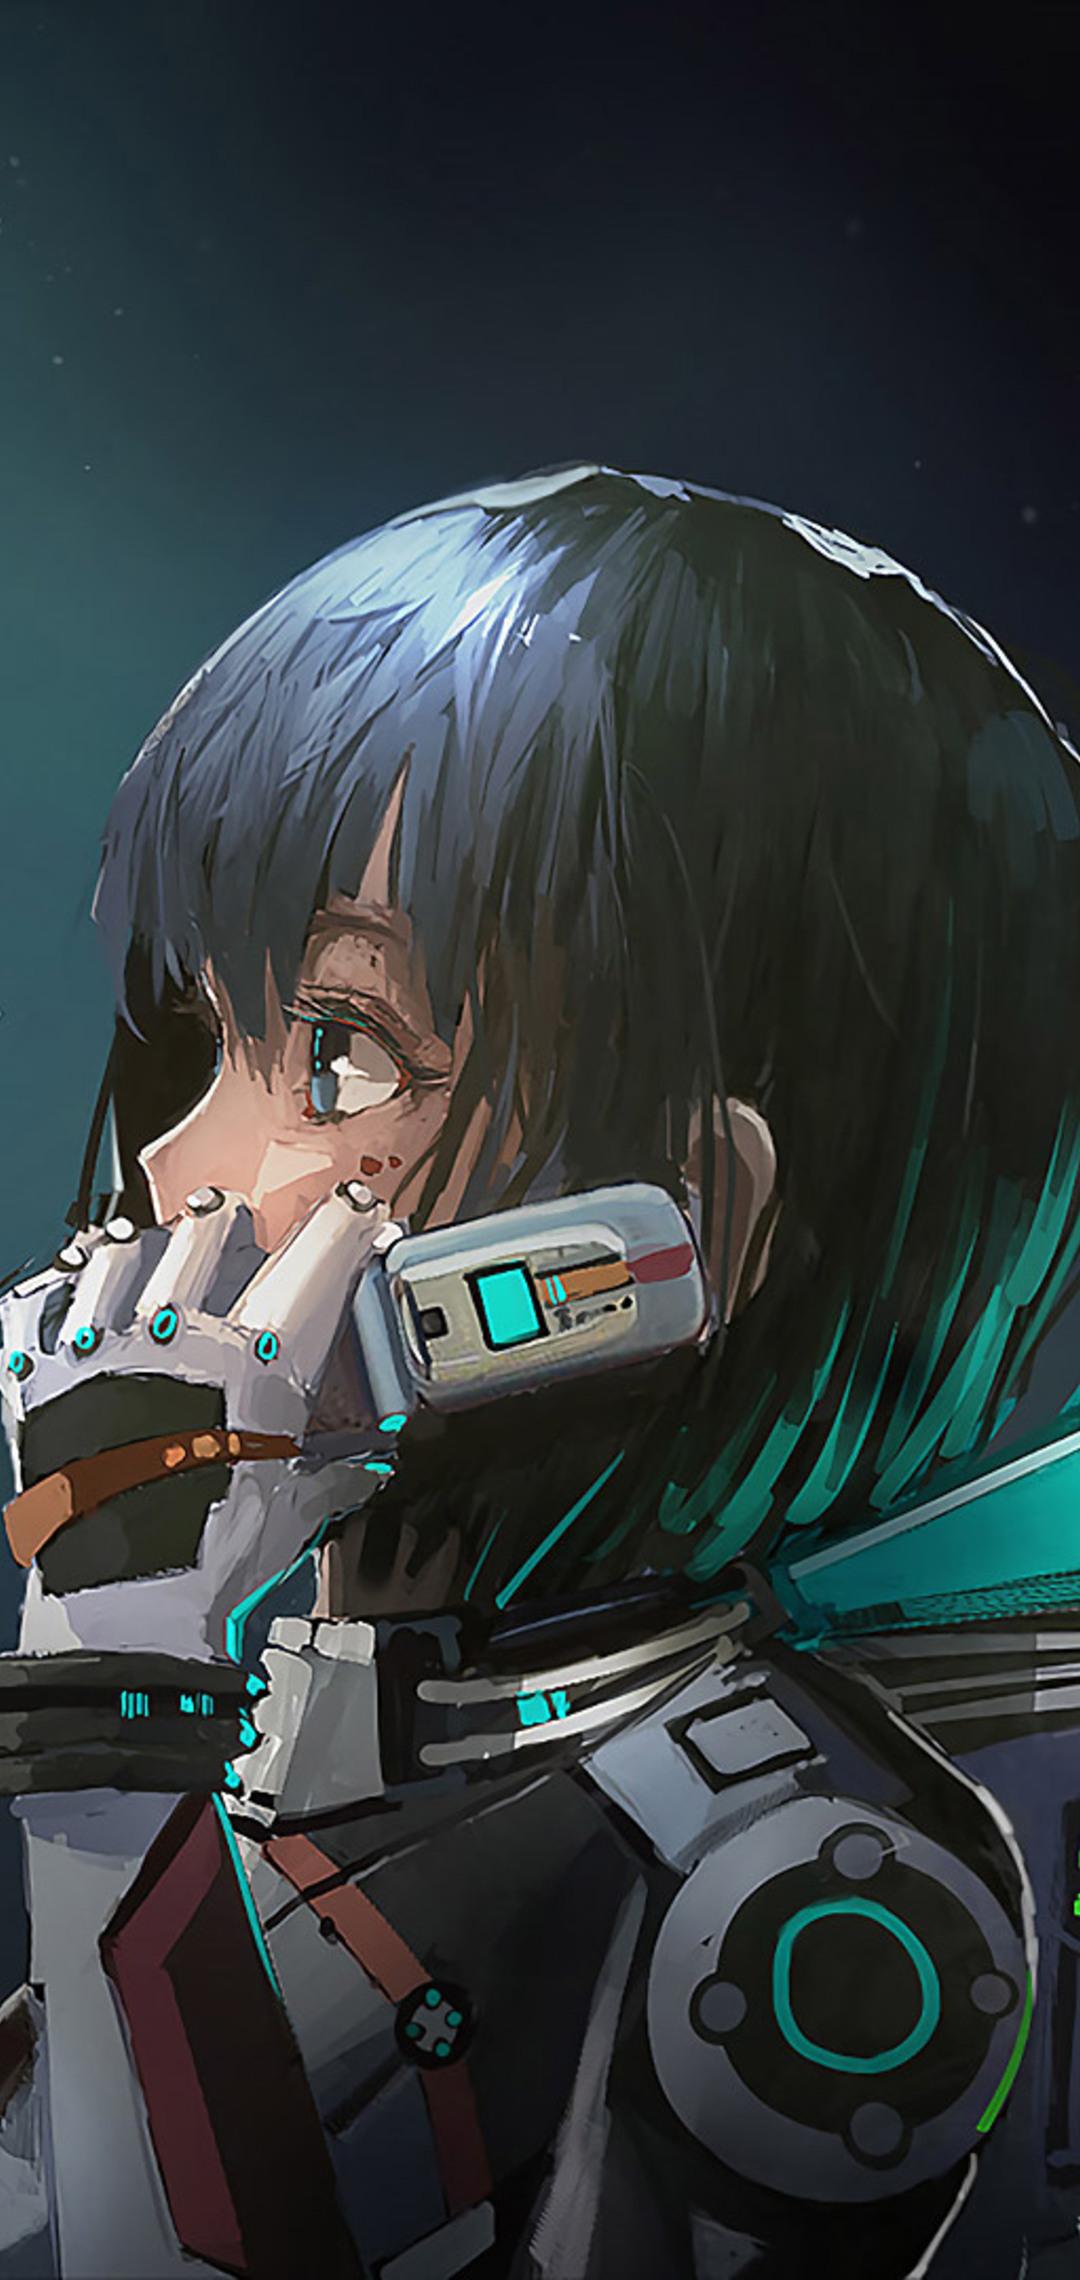 1080x2280 Astronaut Anime Girl One Plus 6 Huawei P20 Honor View 10